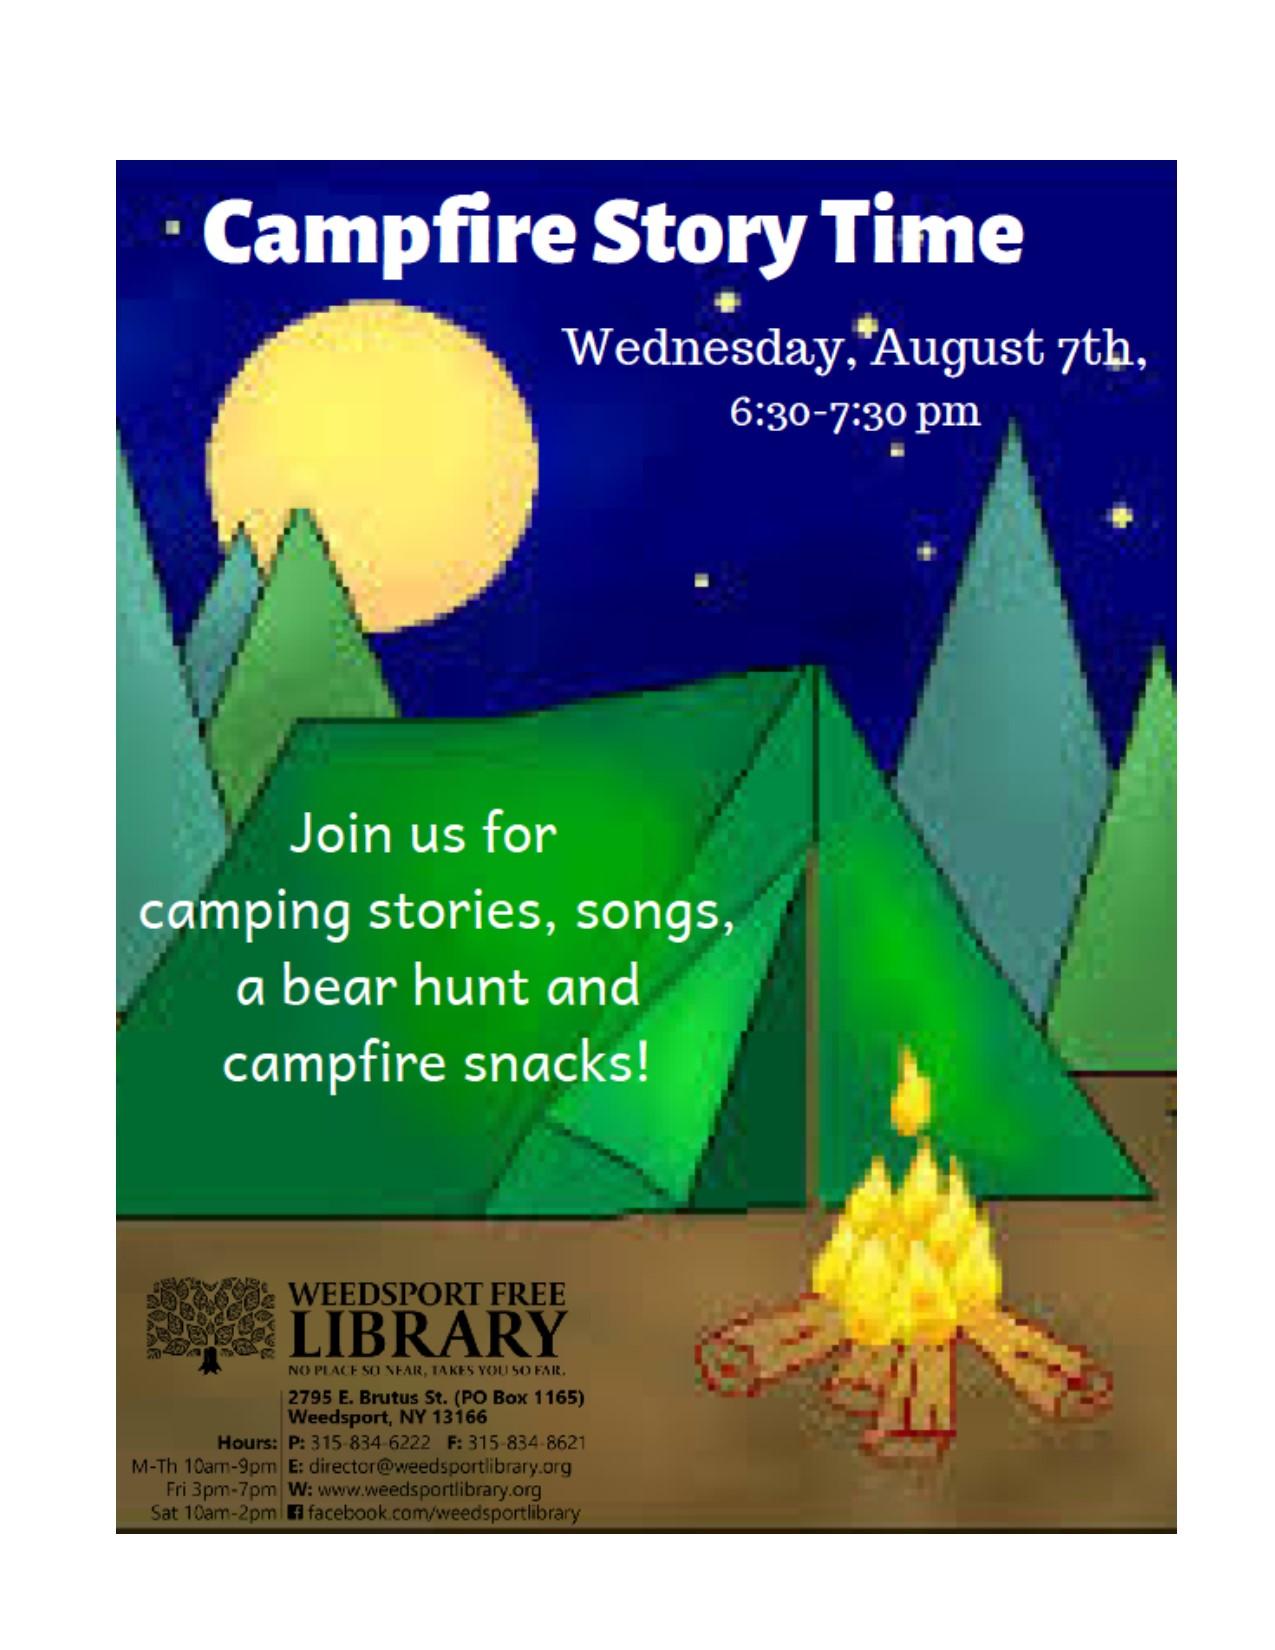 campfirestorytime0819.jpg